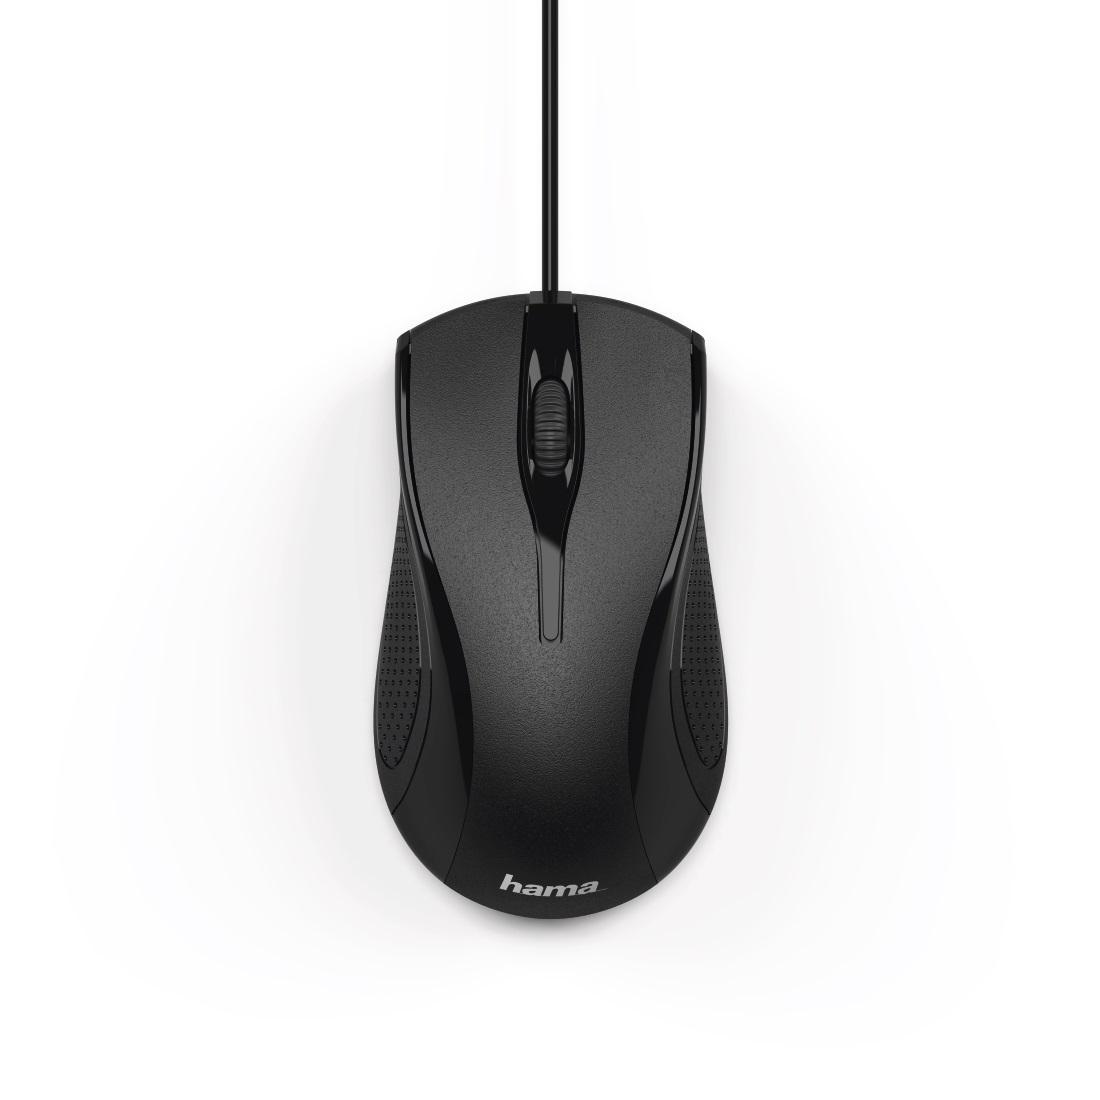 Оптична мишка HAMA MC-200, кабел 1.5 м, USB, 1200 dpi, 3 бутона, Черен-2